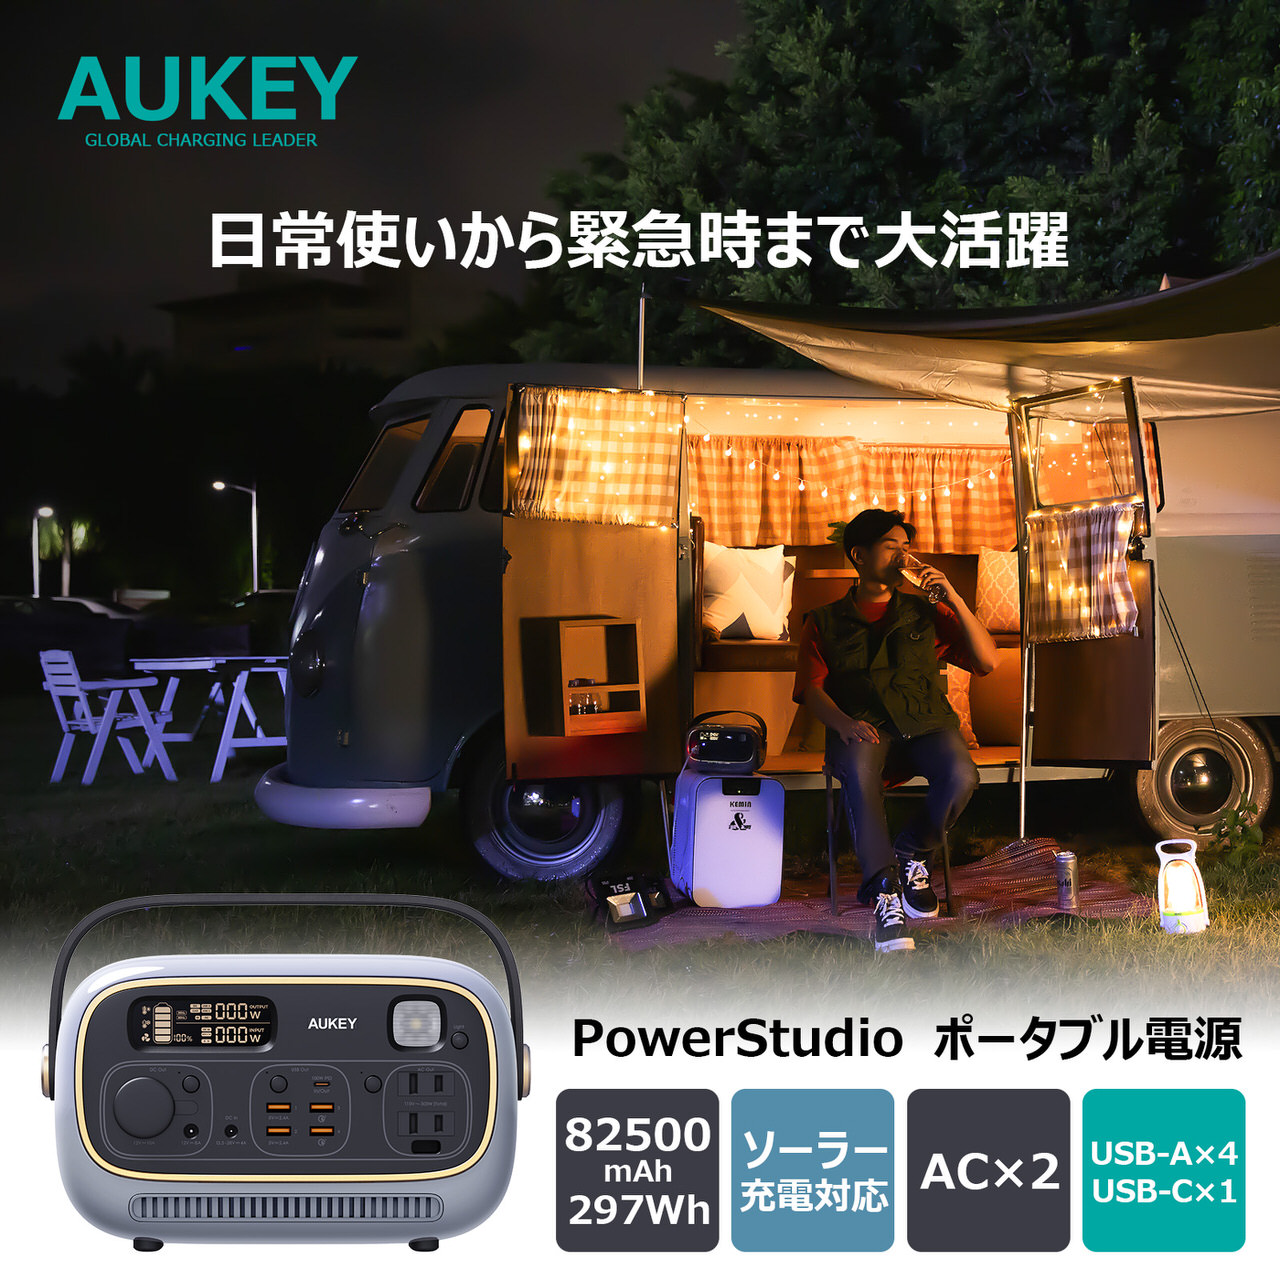 AUKEY、レトロな雰囲気の片手で持てるポータブル電源「PowerStudio」39,800円で発売